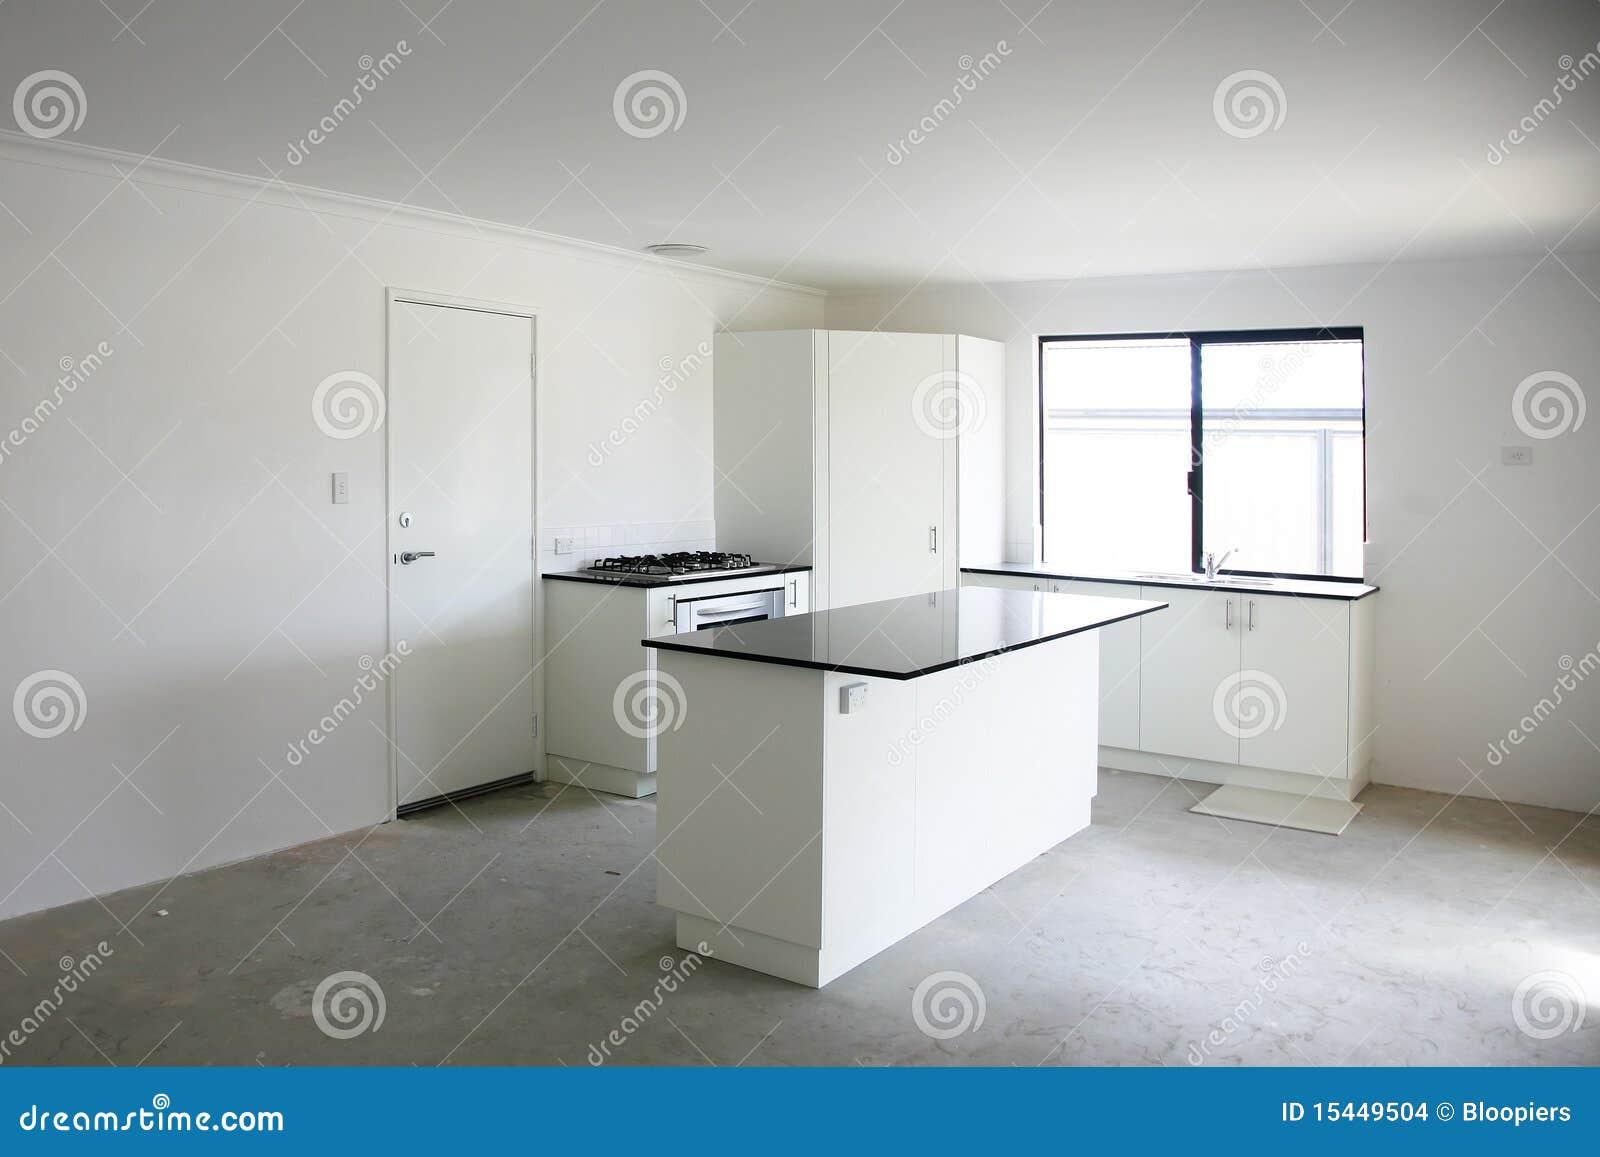 Empty Kitchen Stock Images Image 15449504